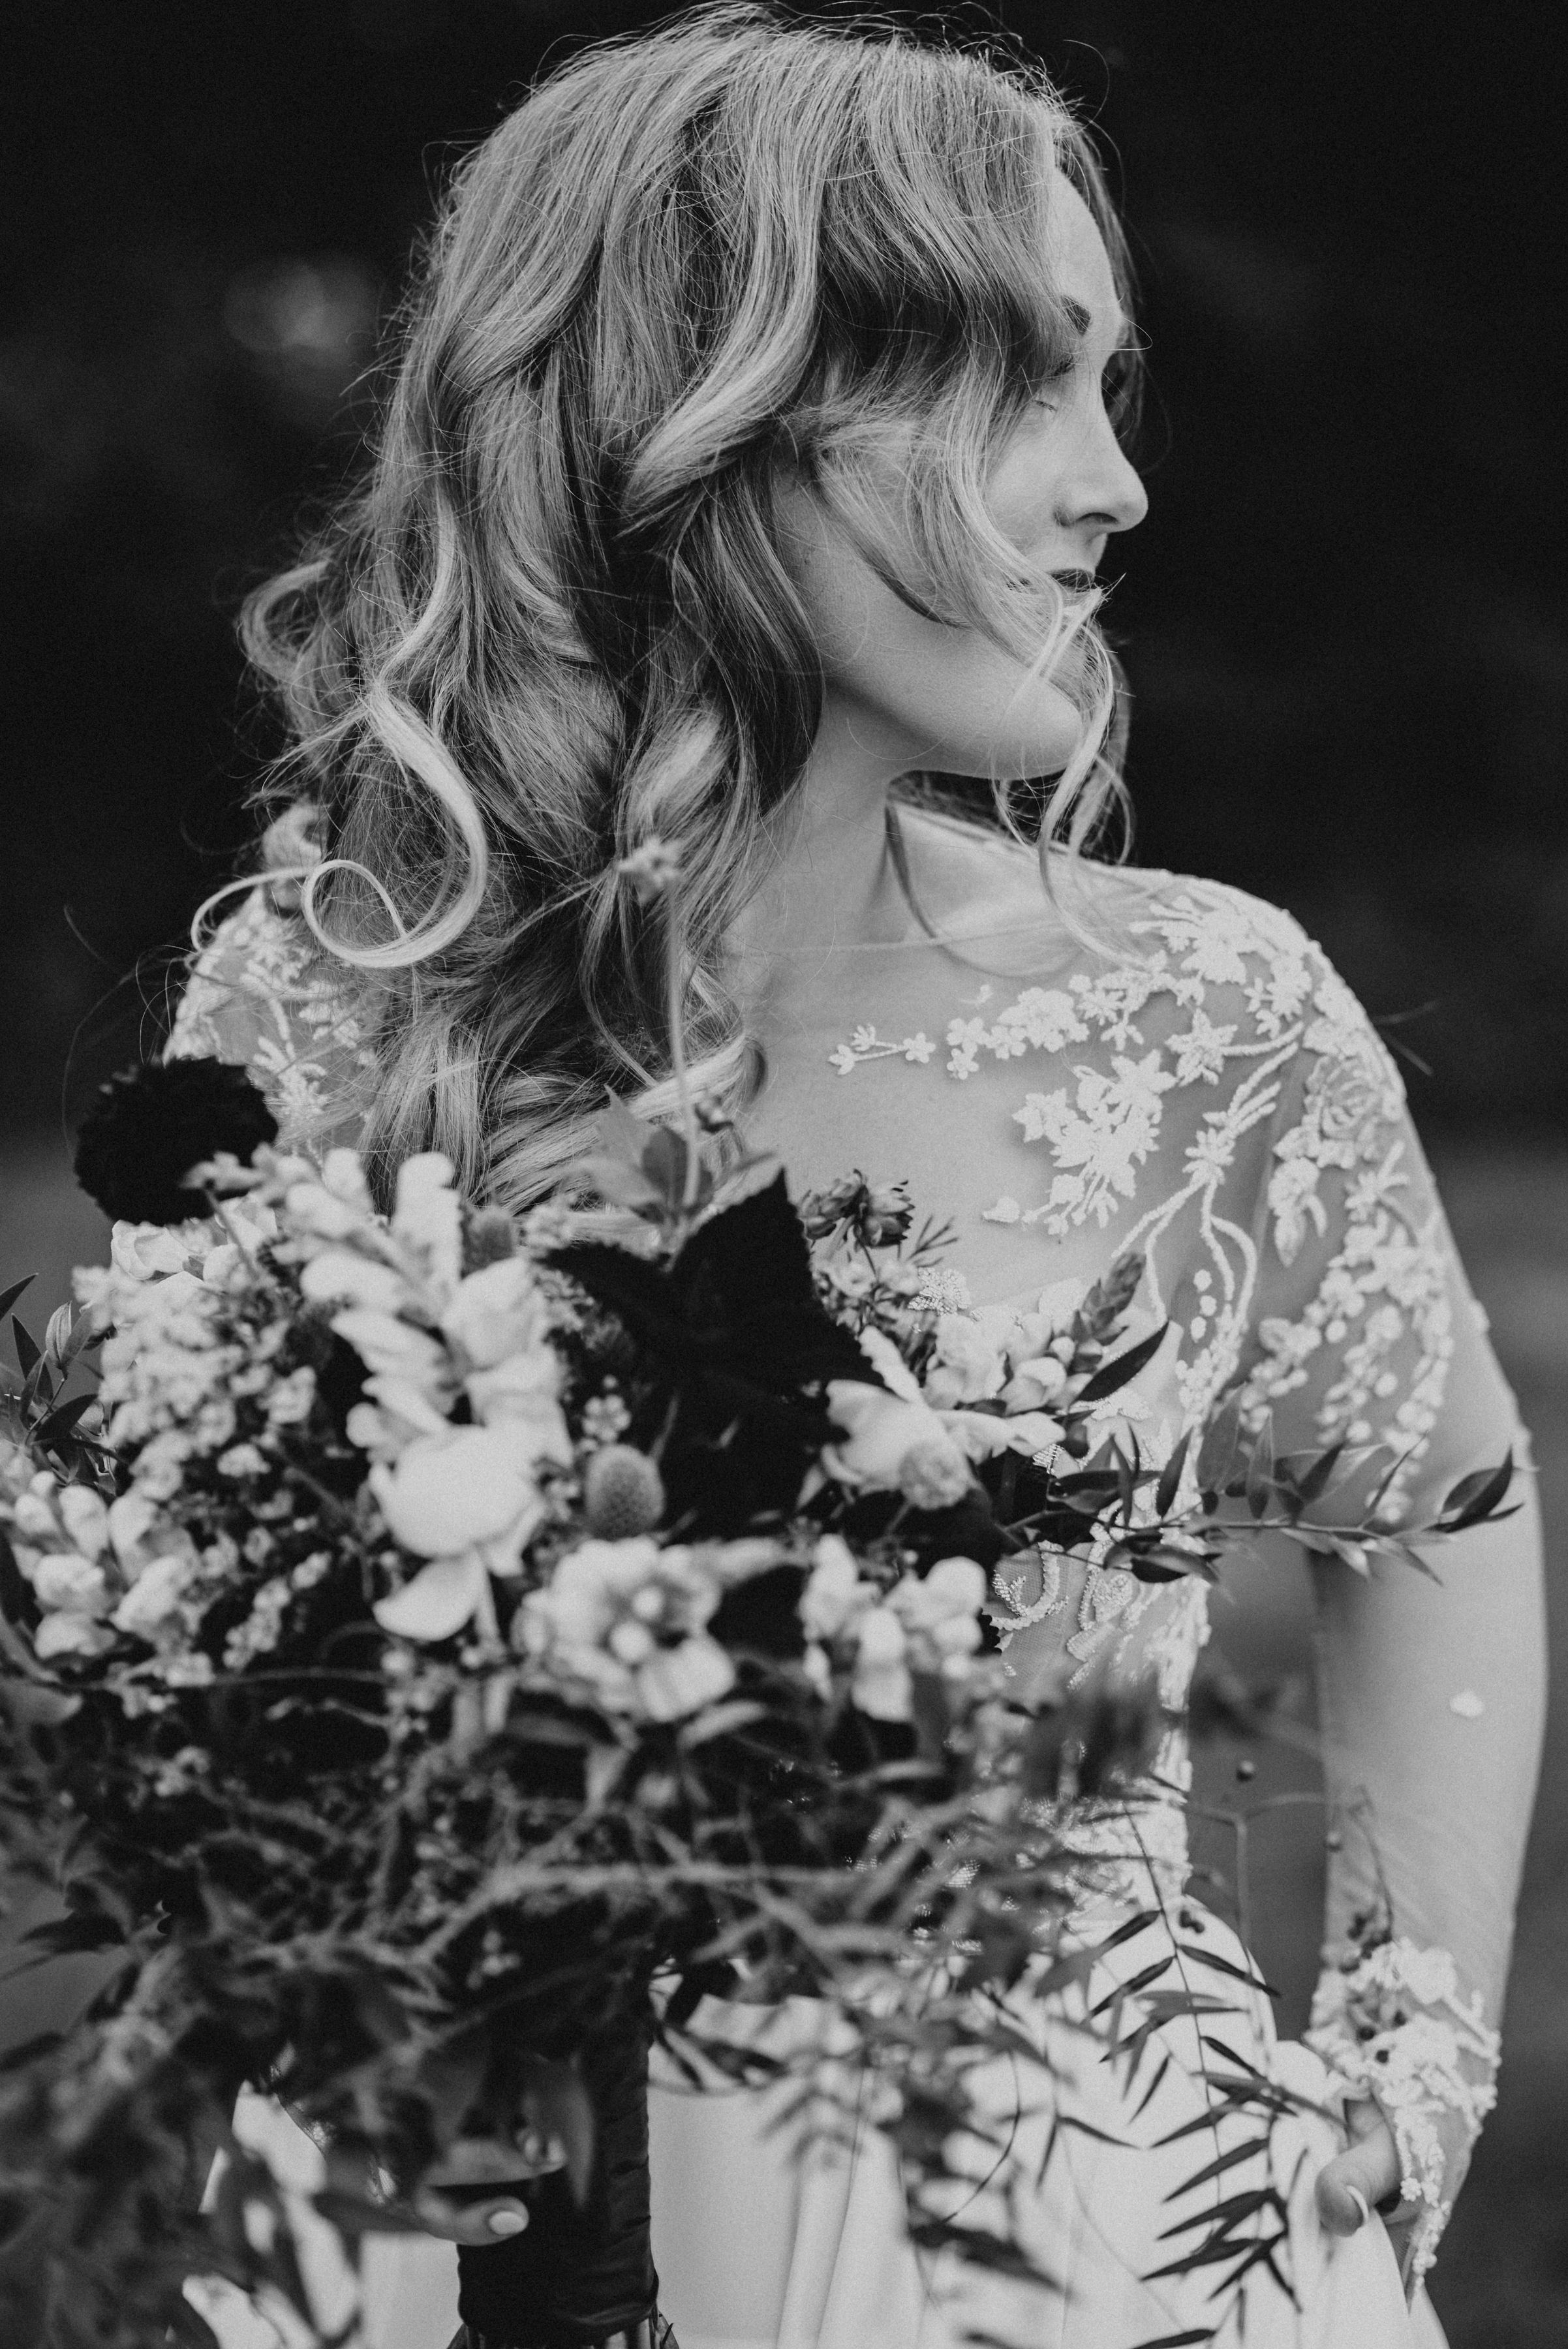 ryan-lauren-wedding-at-montfair-resort-farm-lindsey-paradiso-photography-7712.jpg